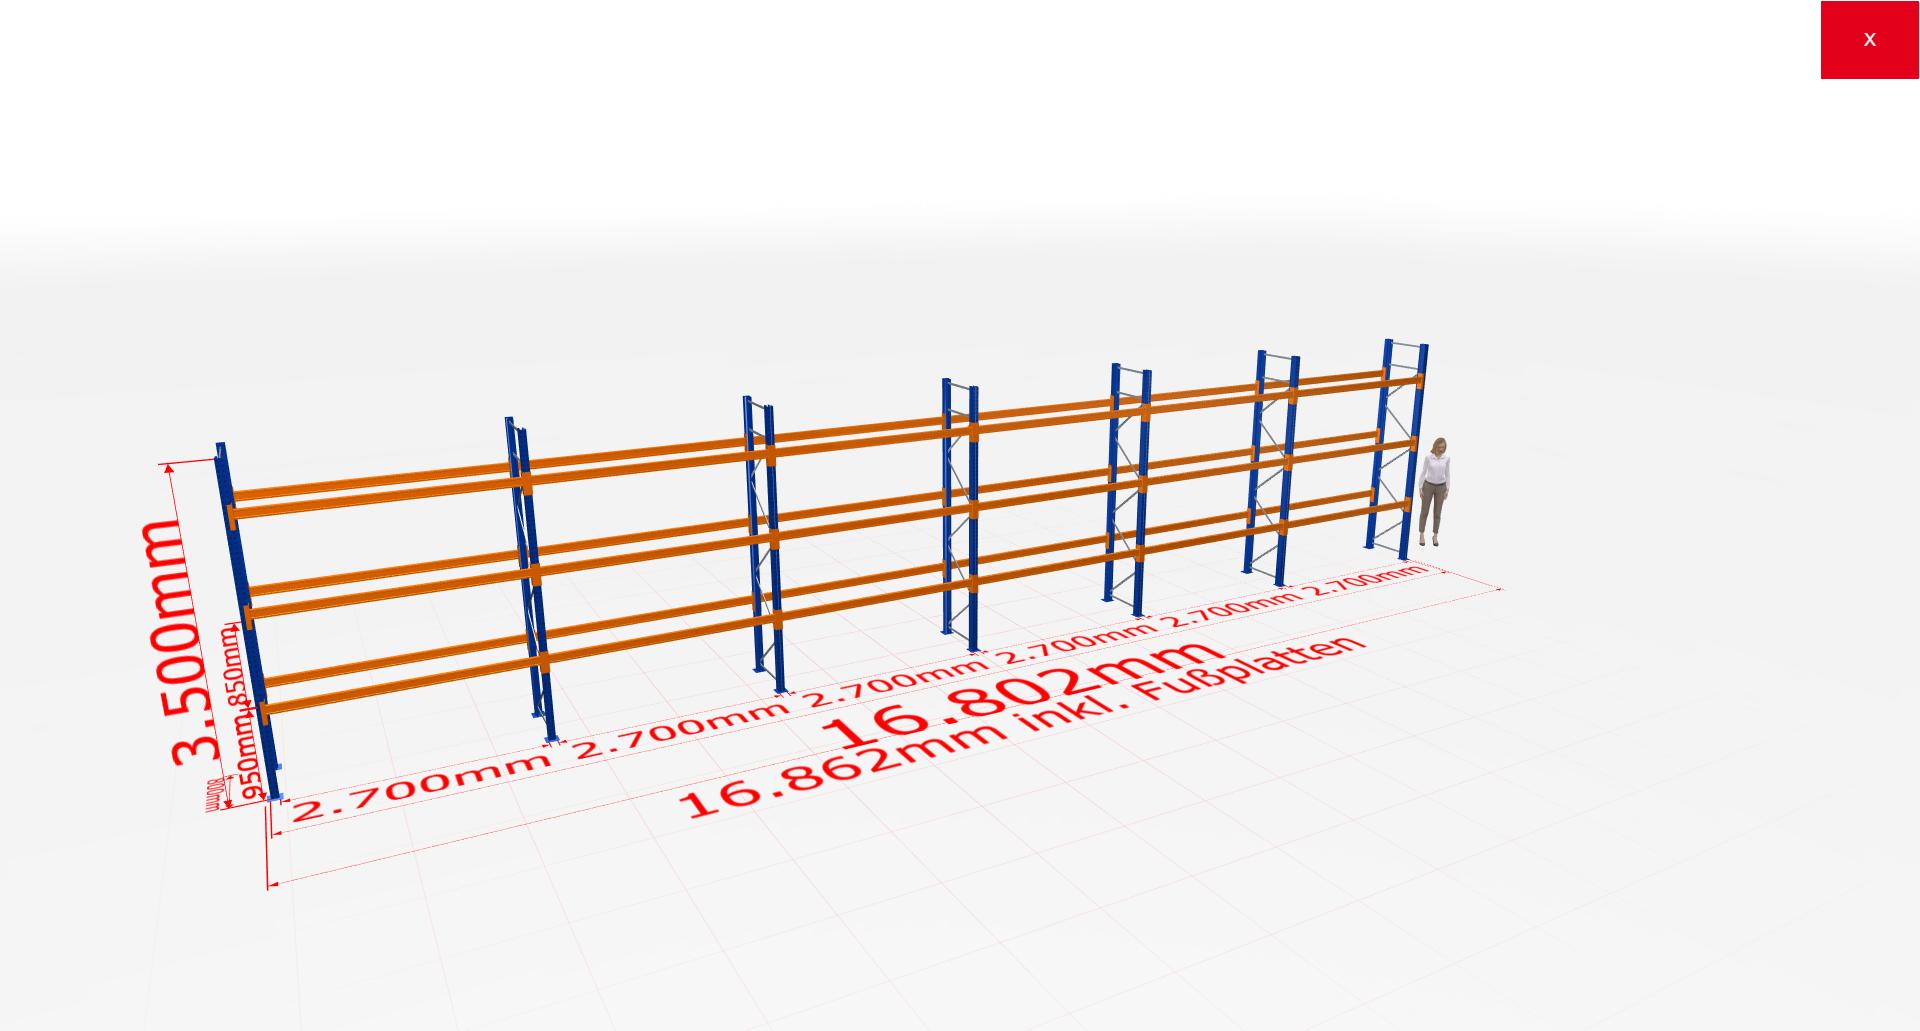 Palettenregal Komplettregal 3500x16802x800 mm (HxBxT) 3 Fachebenen SCHULTE Lagertechnik